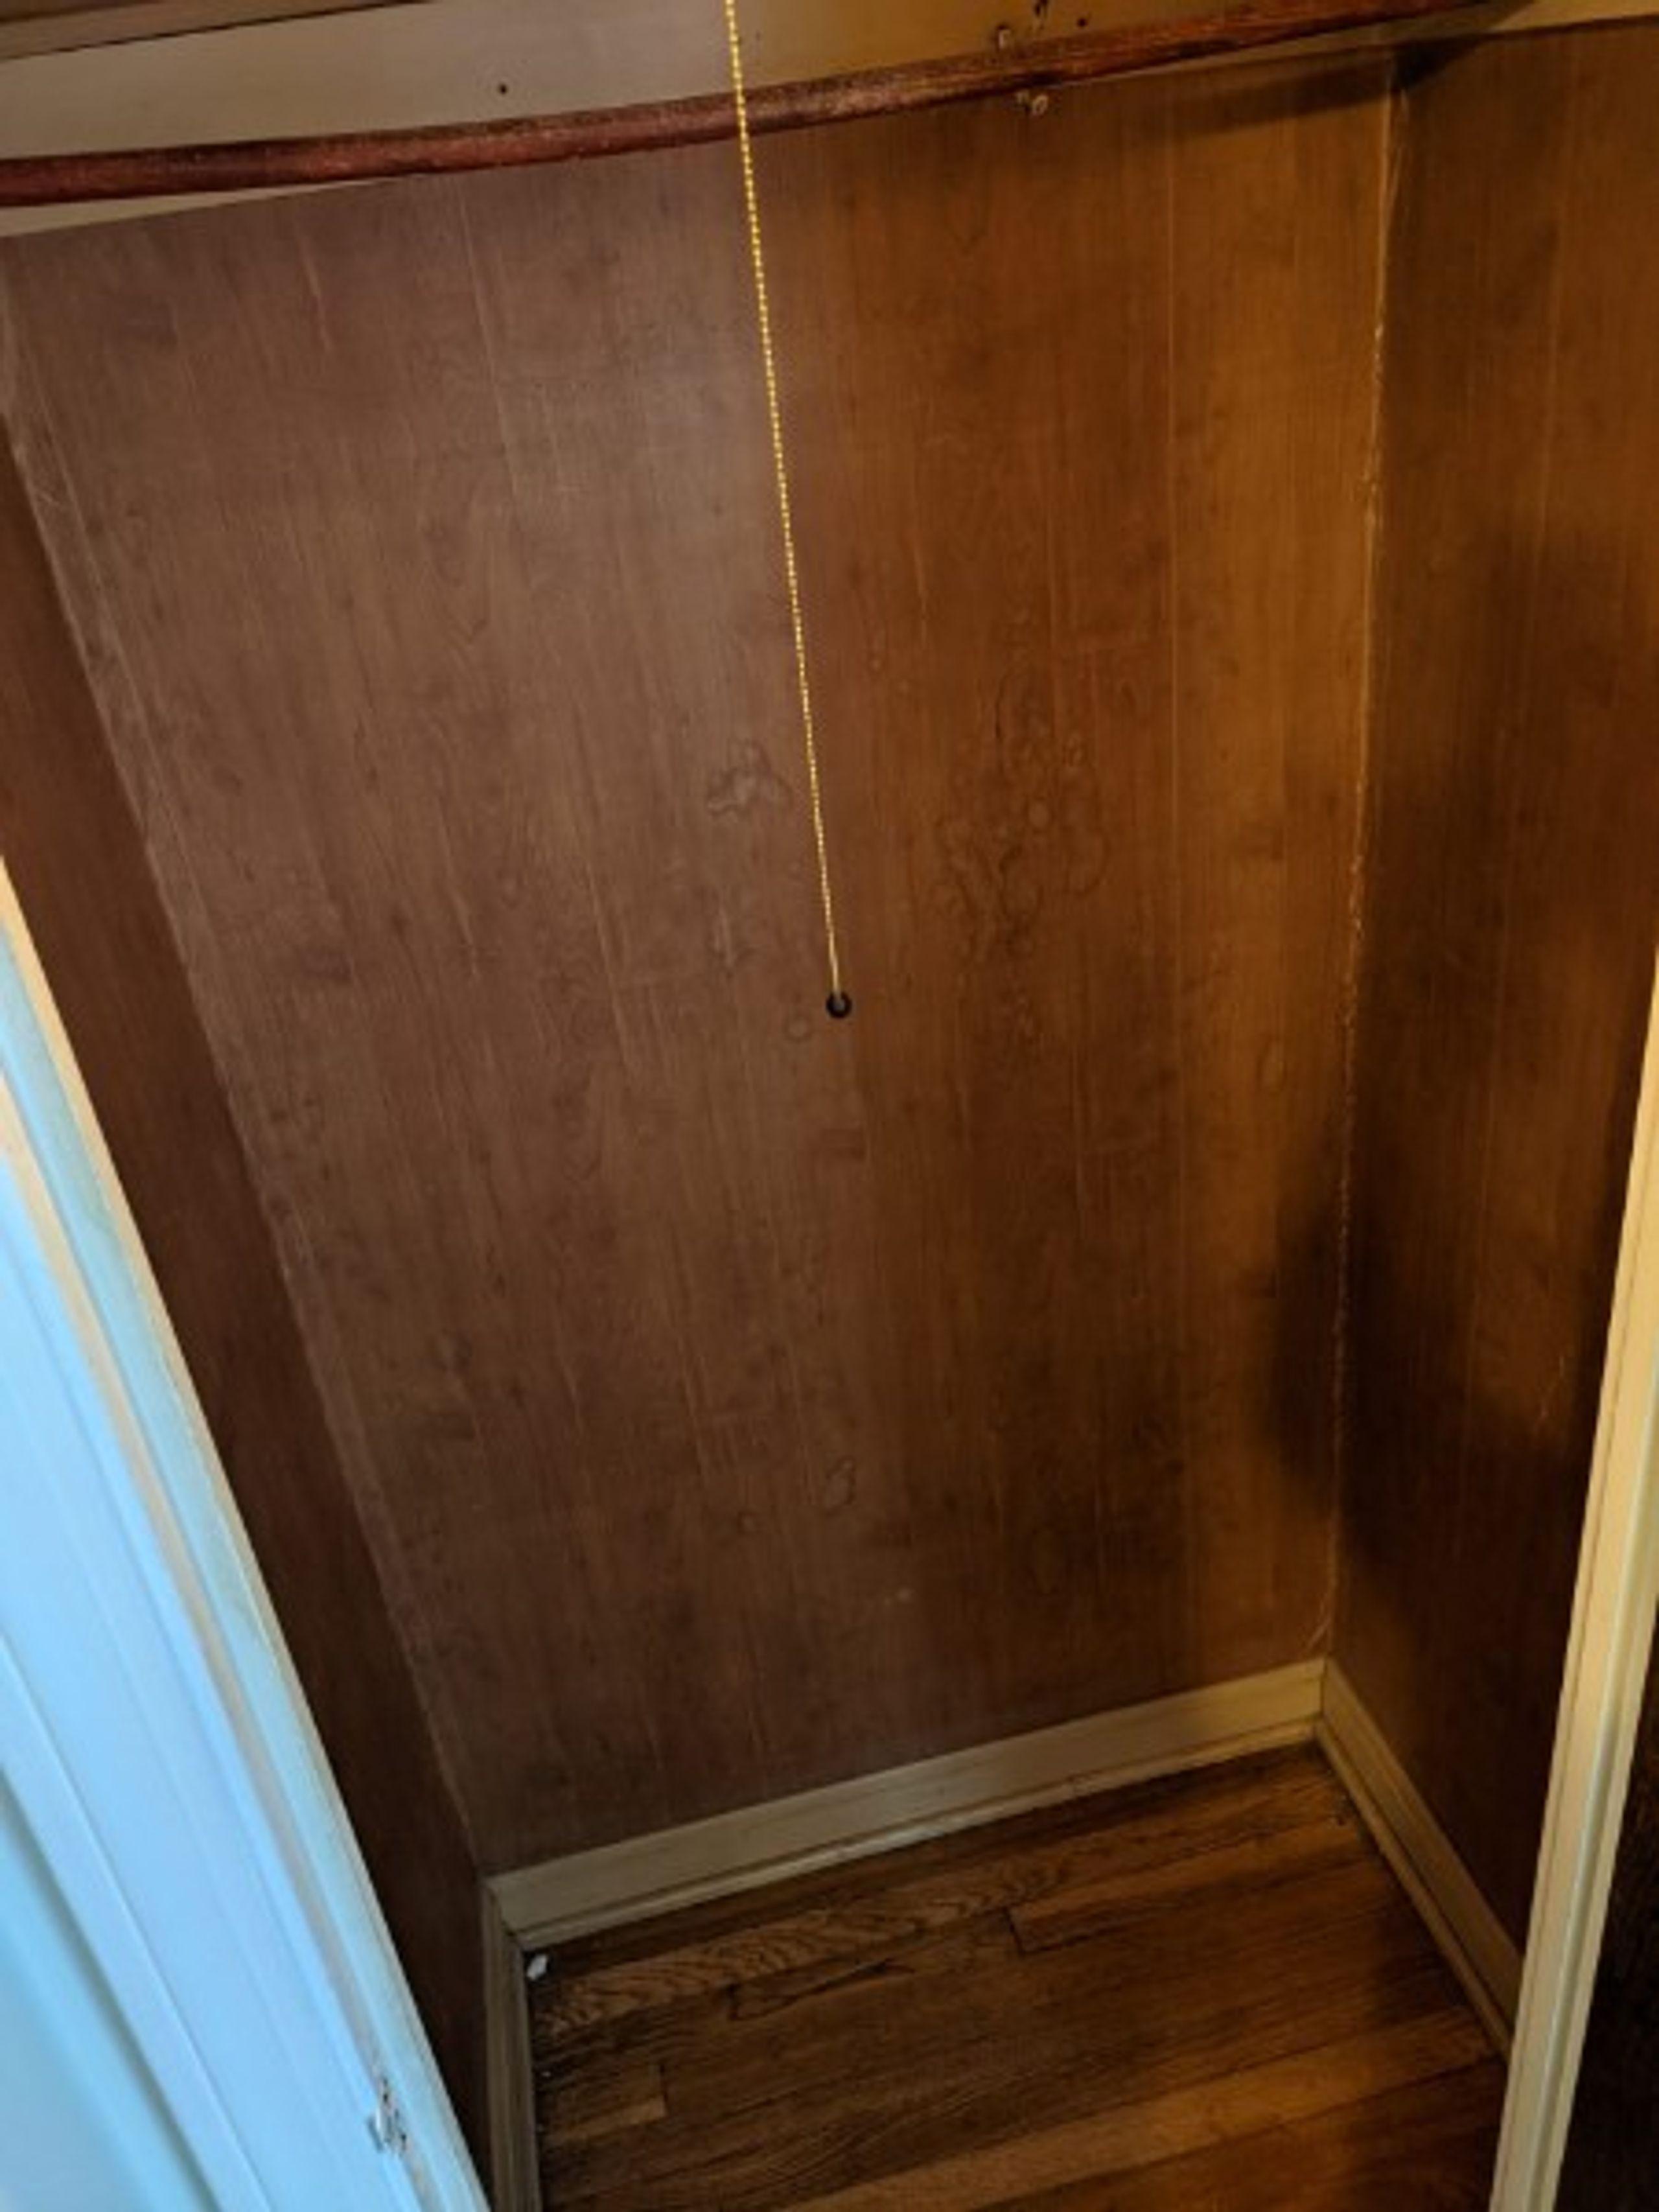 3x2 Closet self storage unit